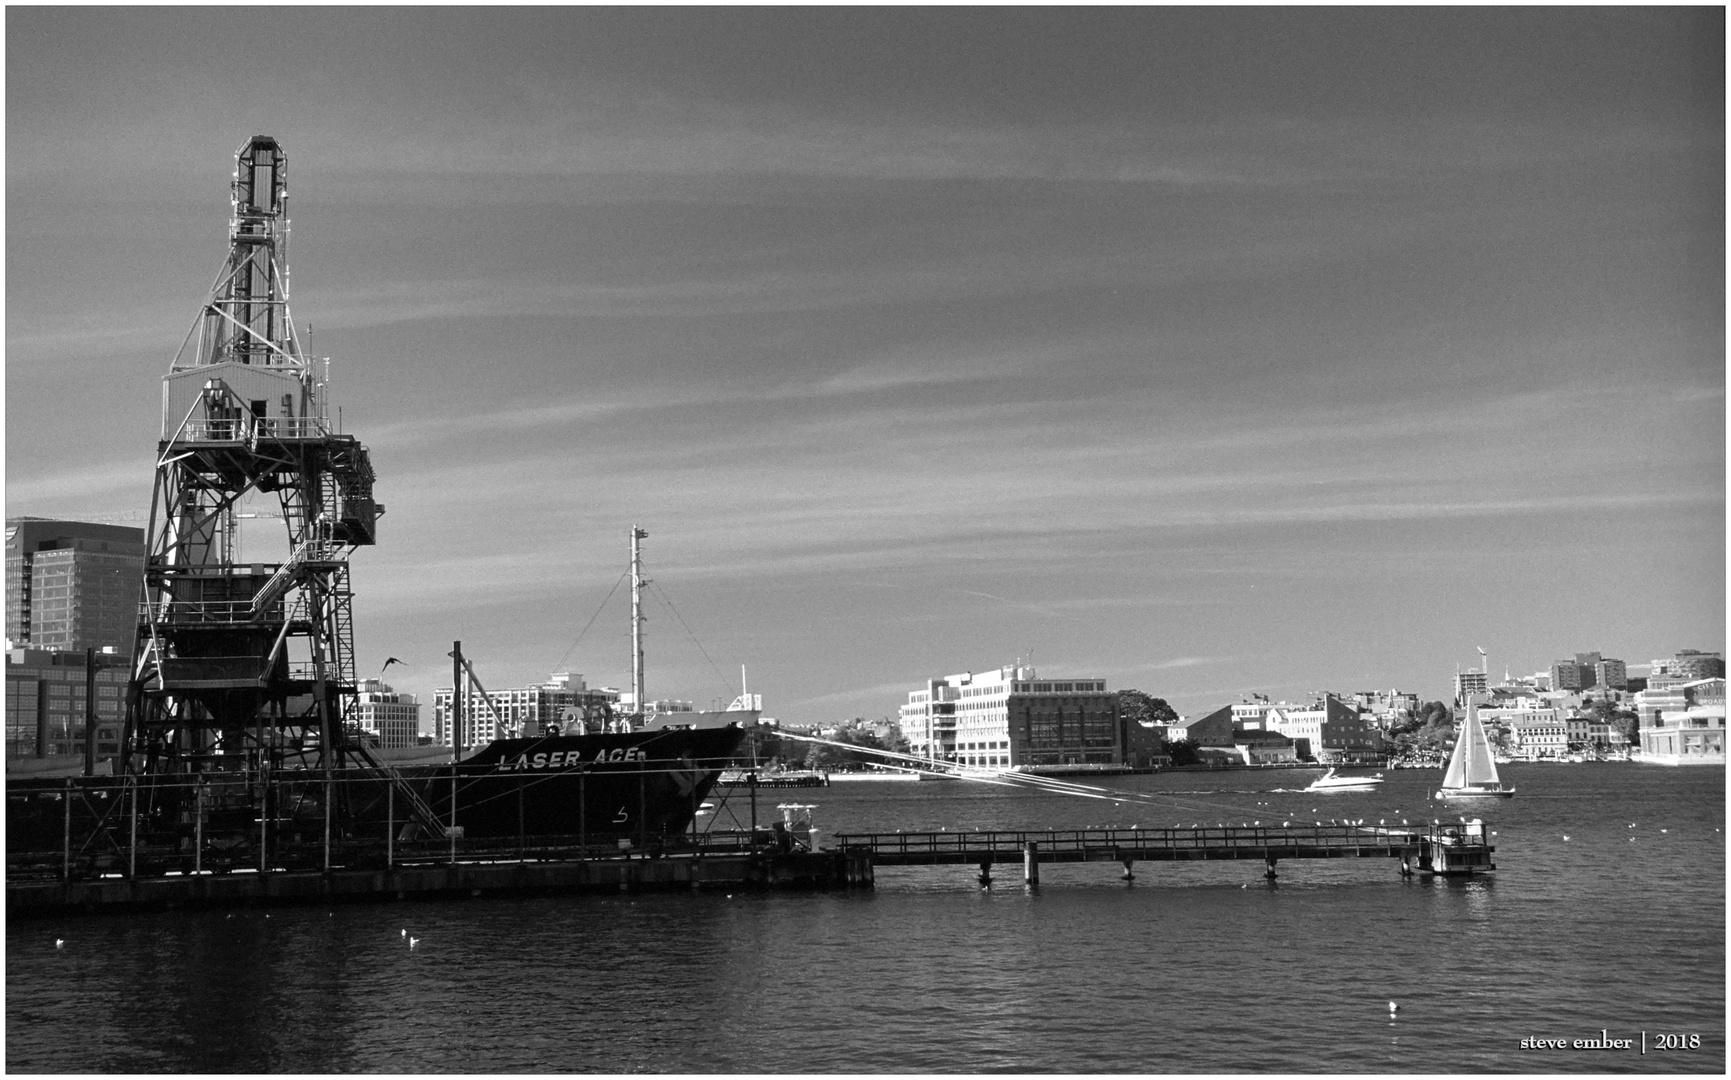 Baltimore Harbor - At Work and At Play